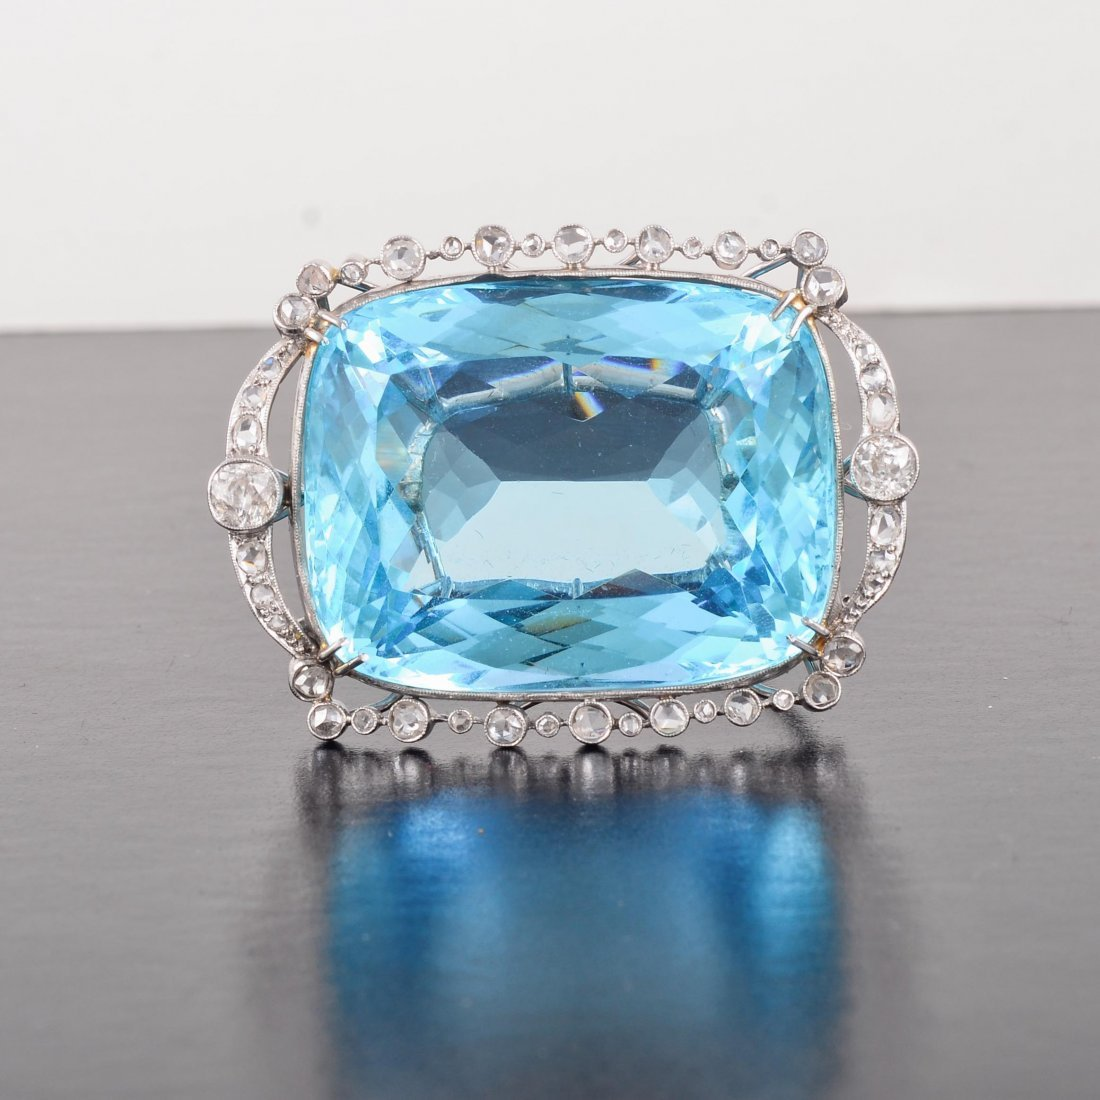 Edwardian platinum large aquamarine brooch